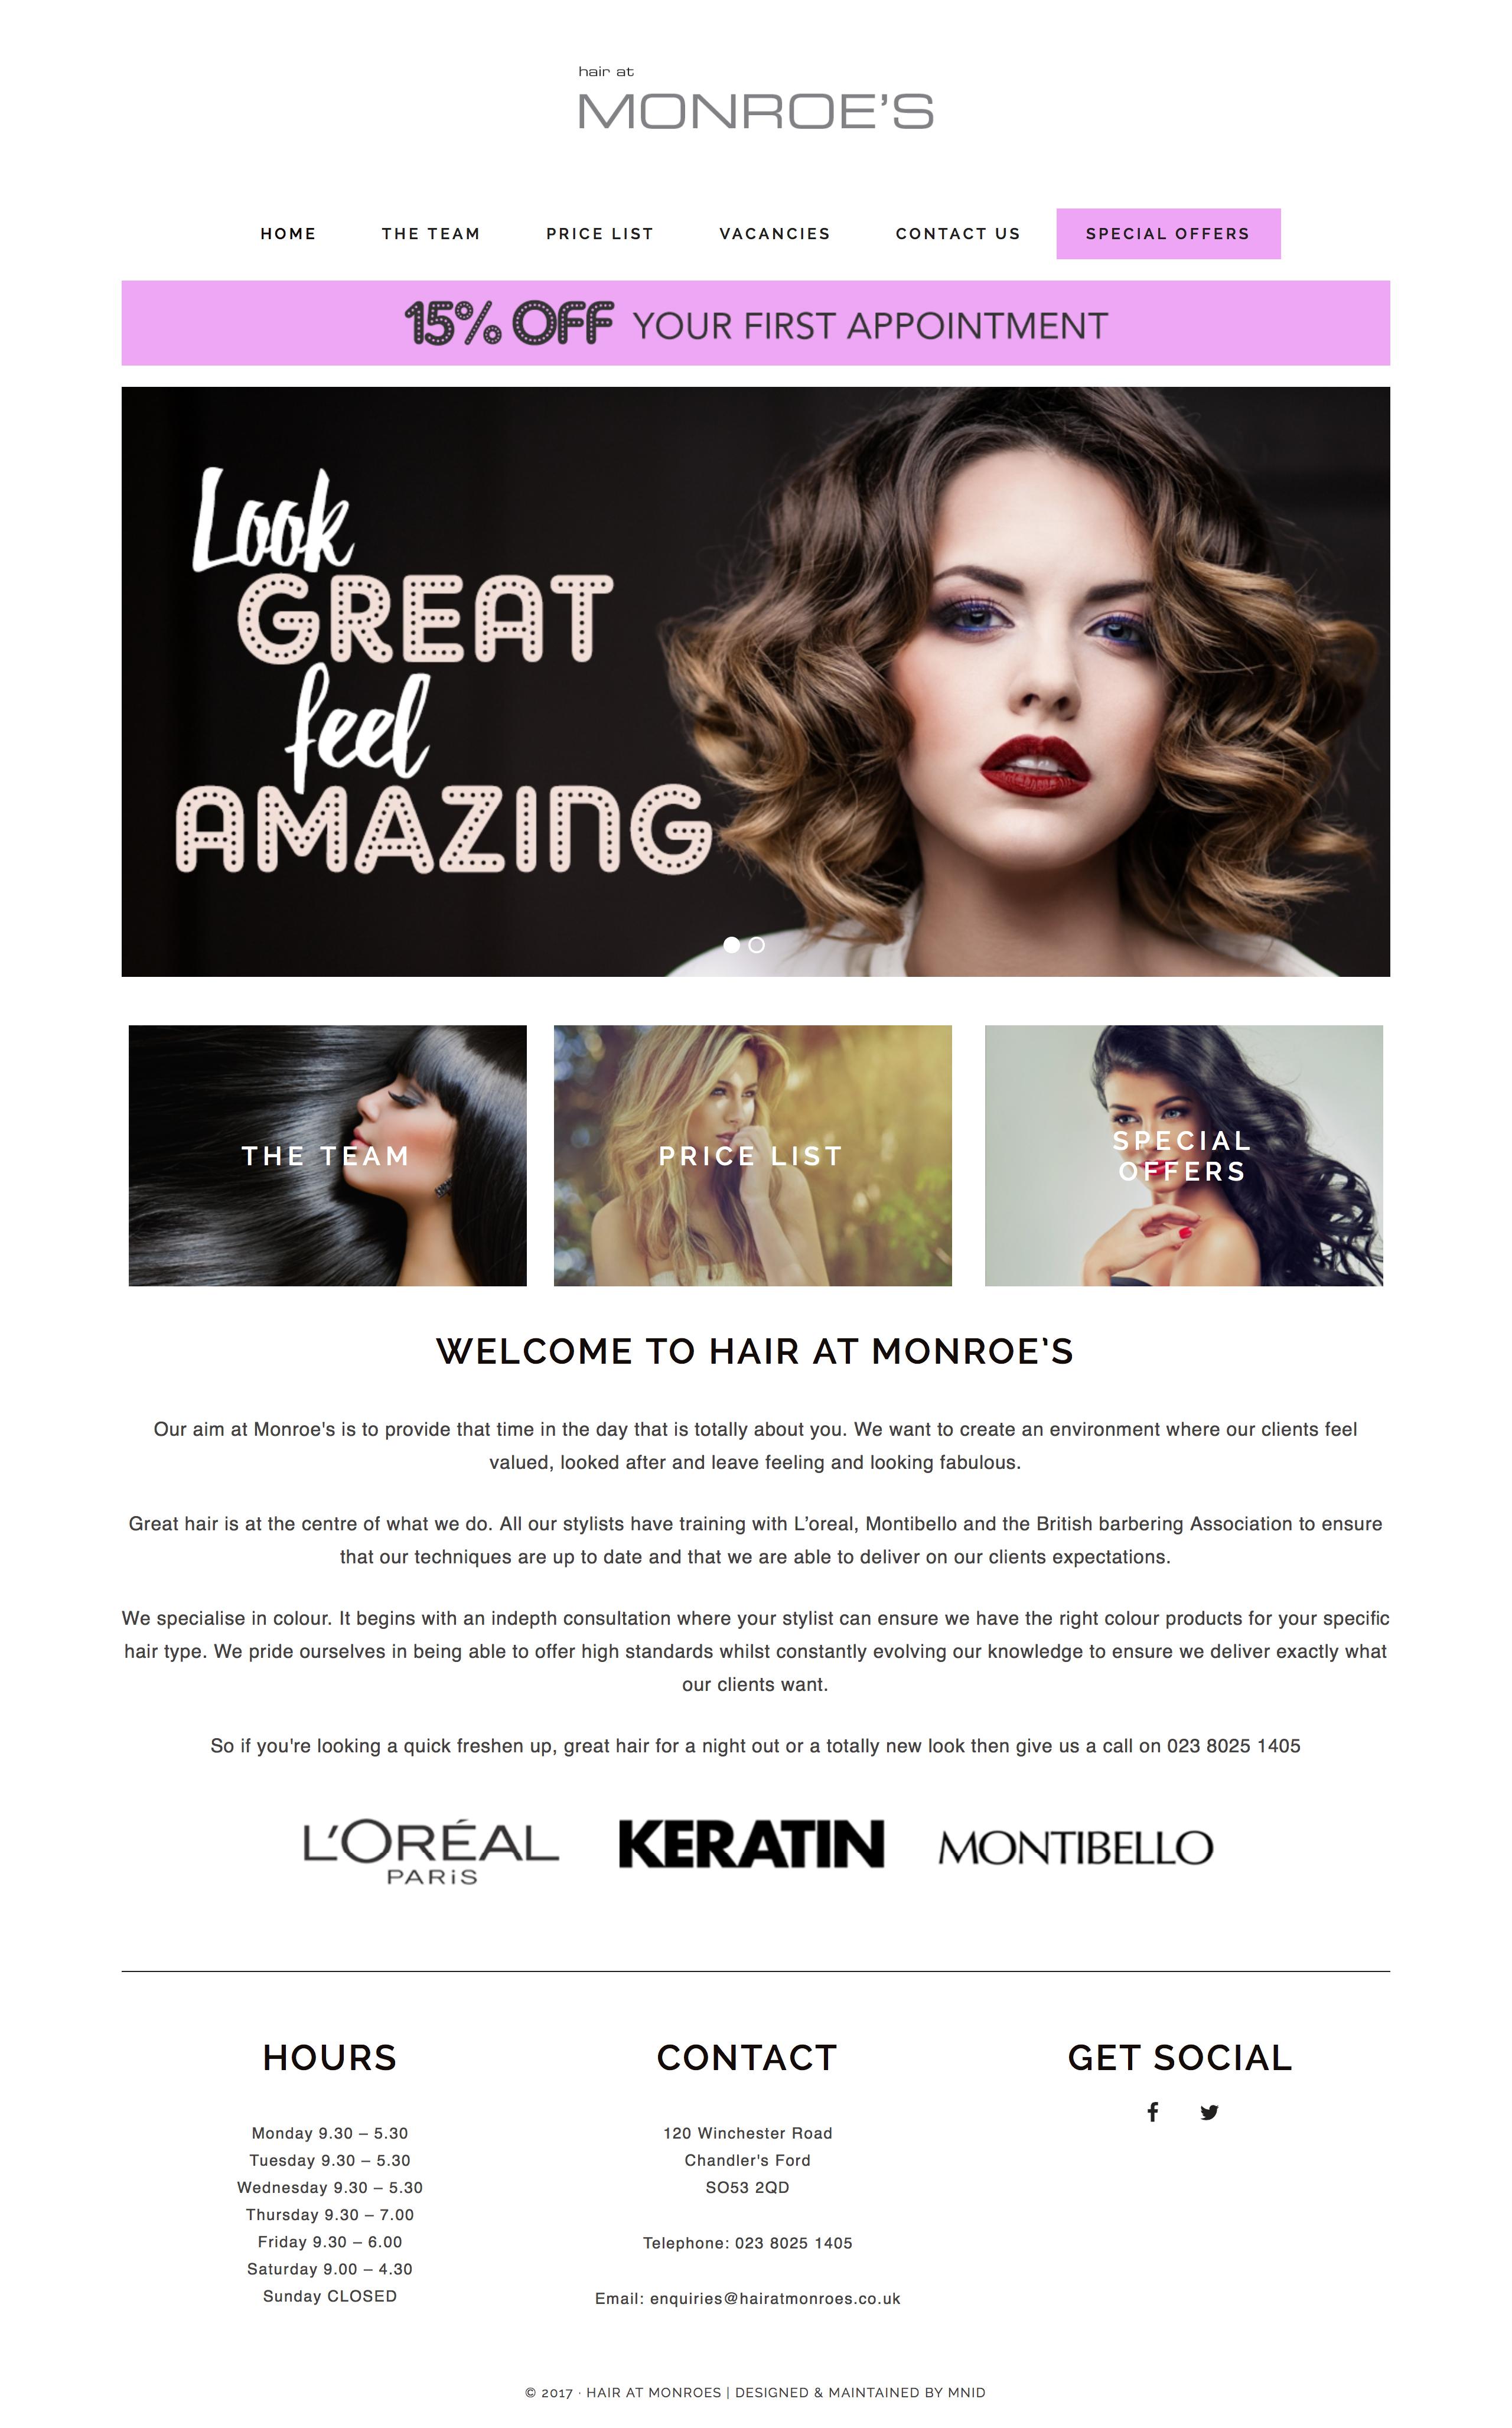 Hair at Monroe's full website homepage design